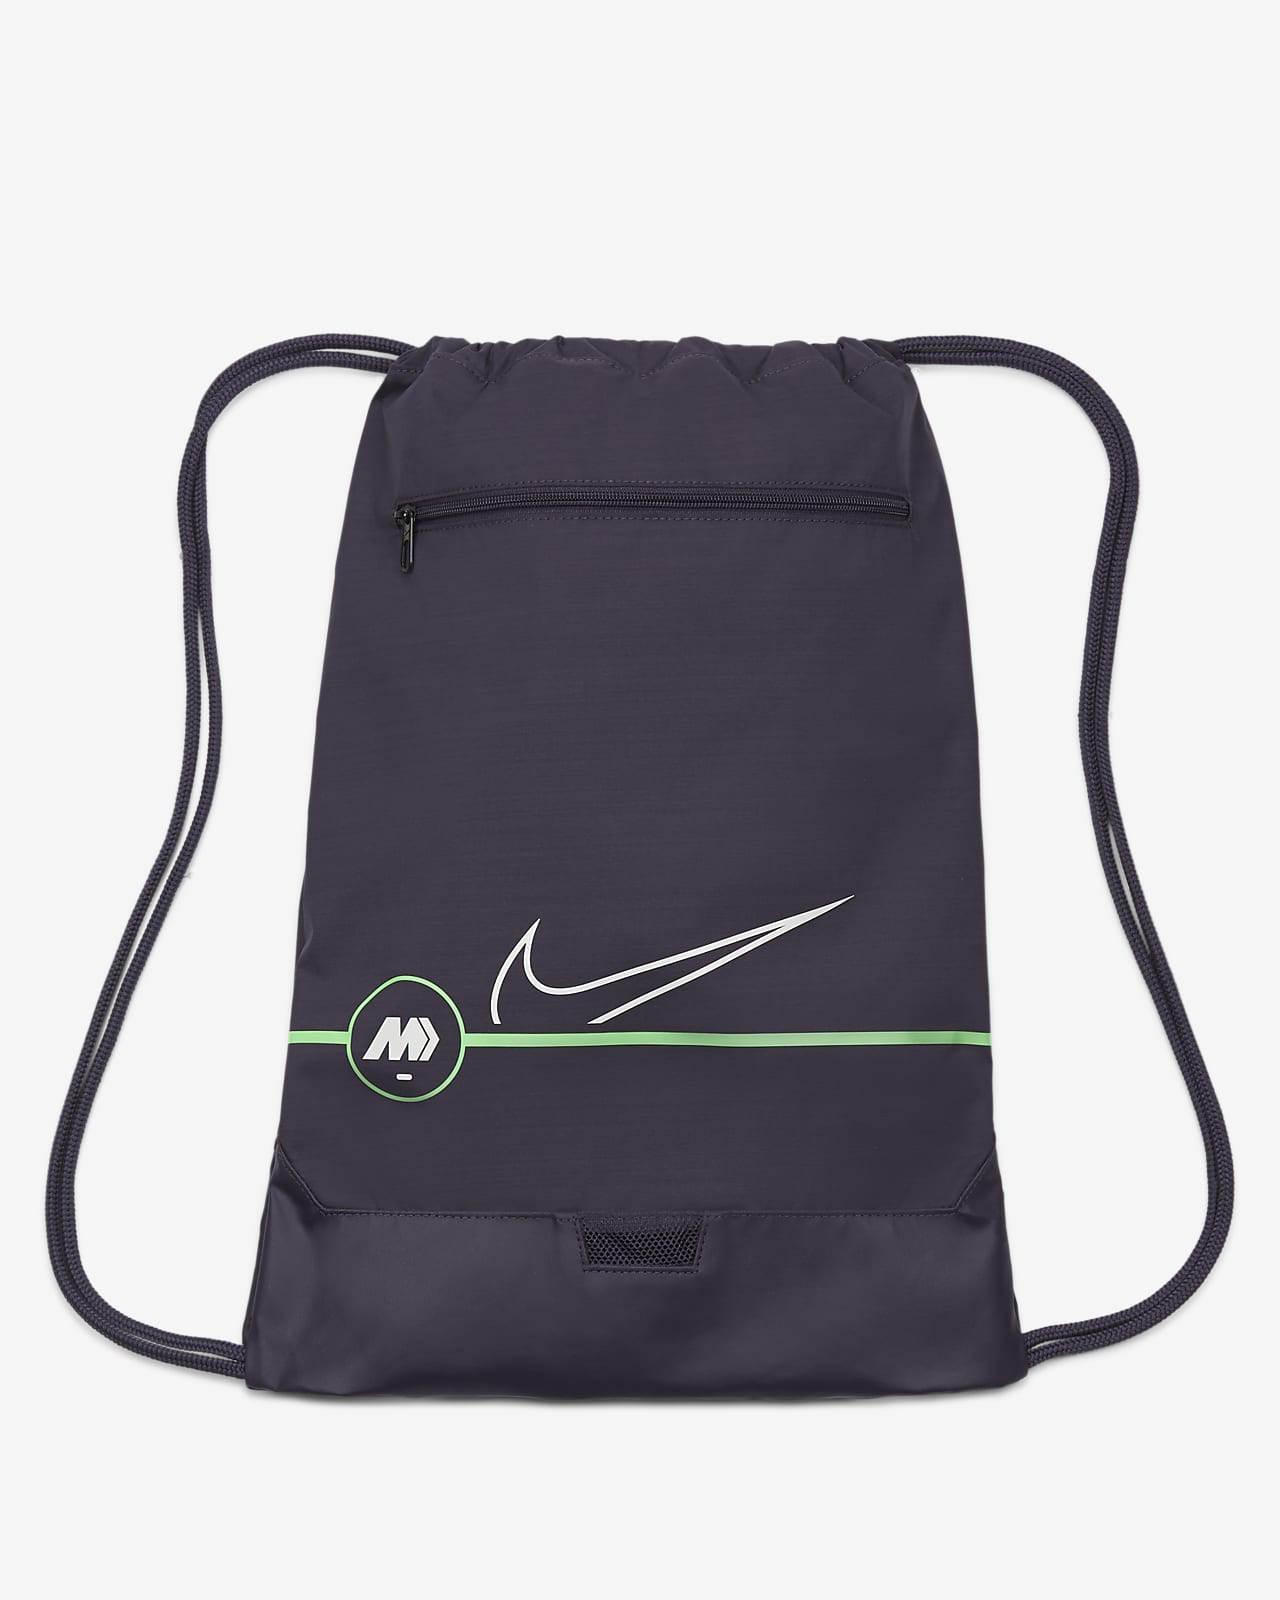 Nike Mercurial Soccer Gymsack